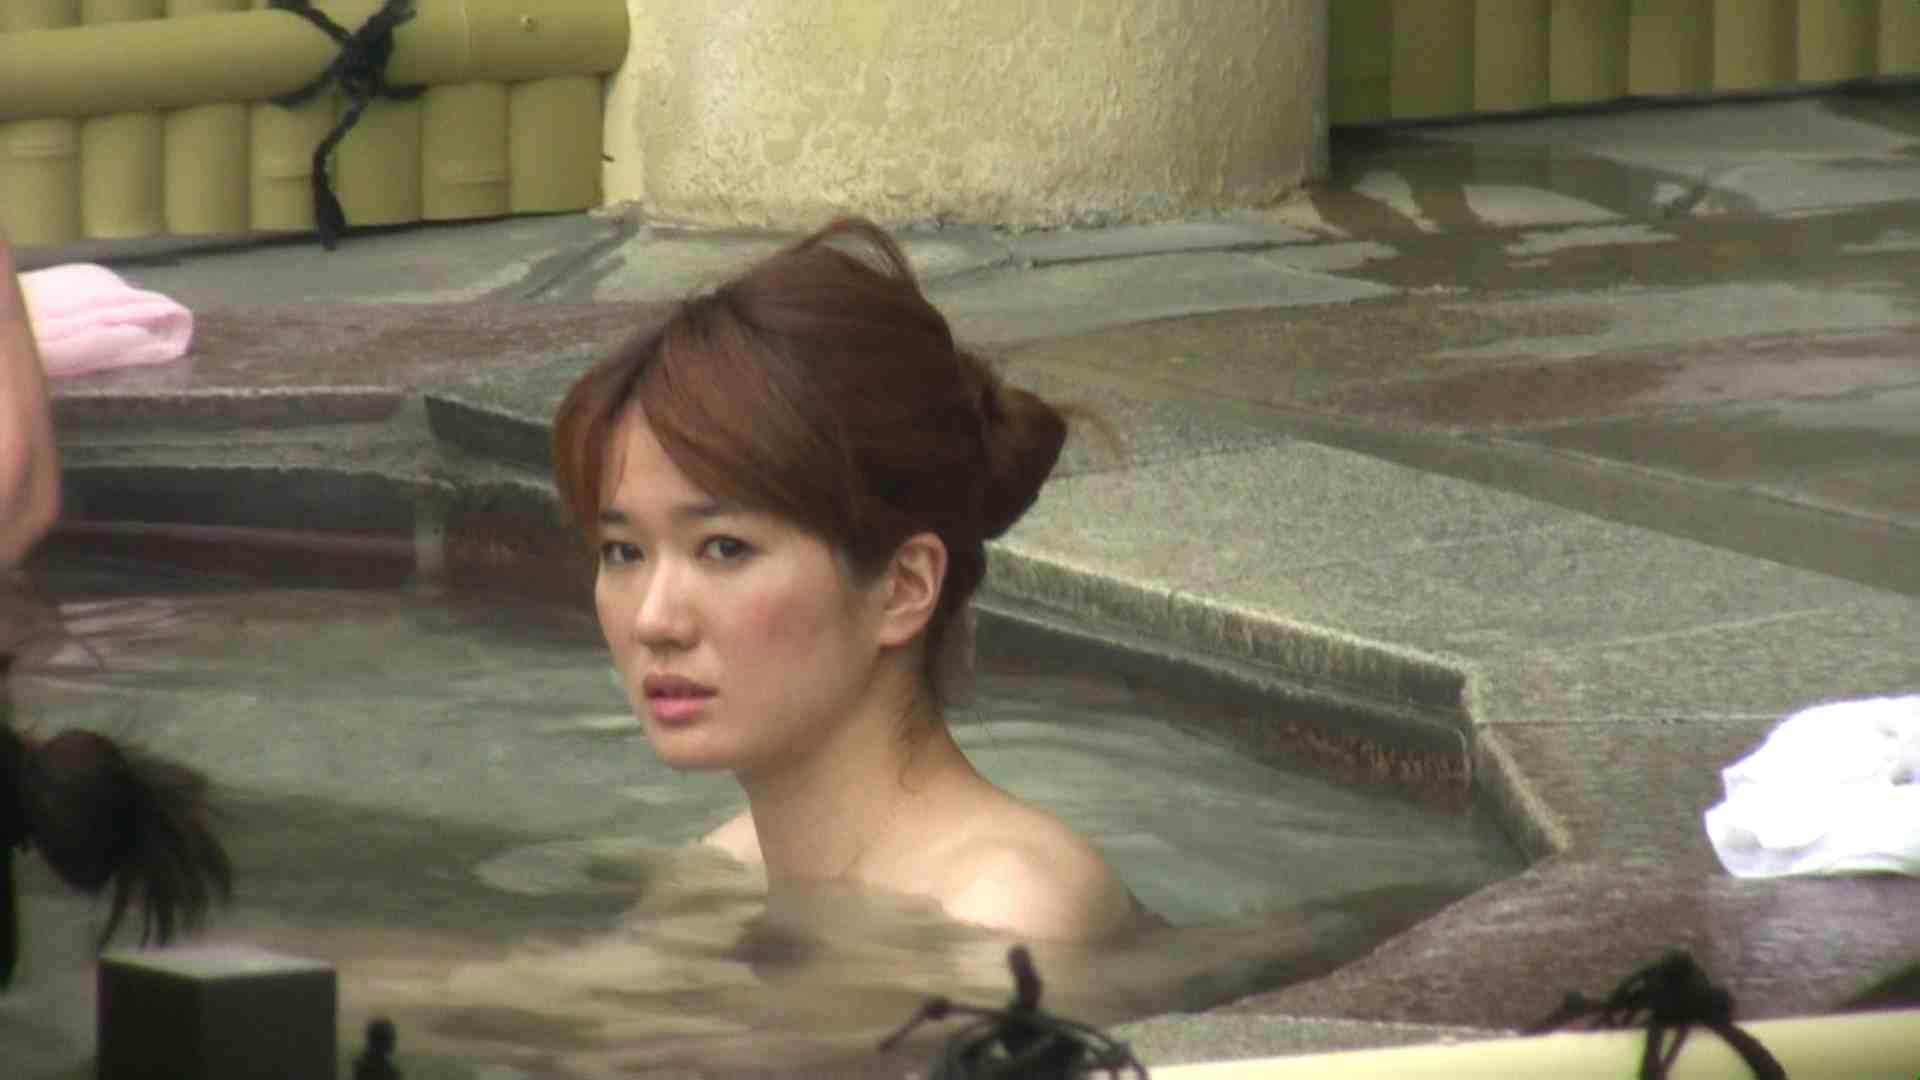 Aquaな露天風呂Vol.110 盗撮映像  46Pix 3